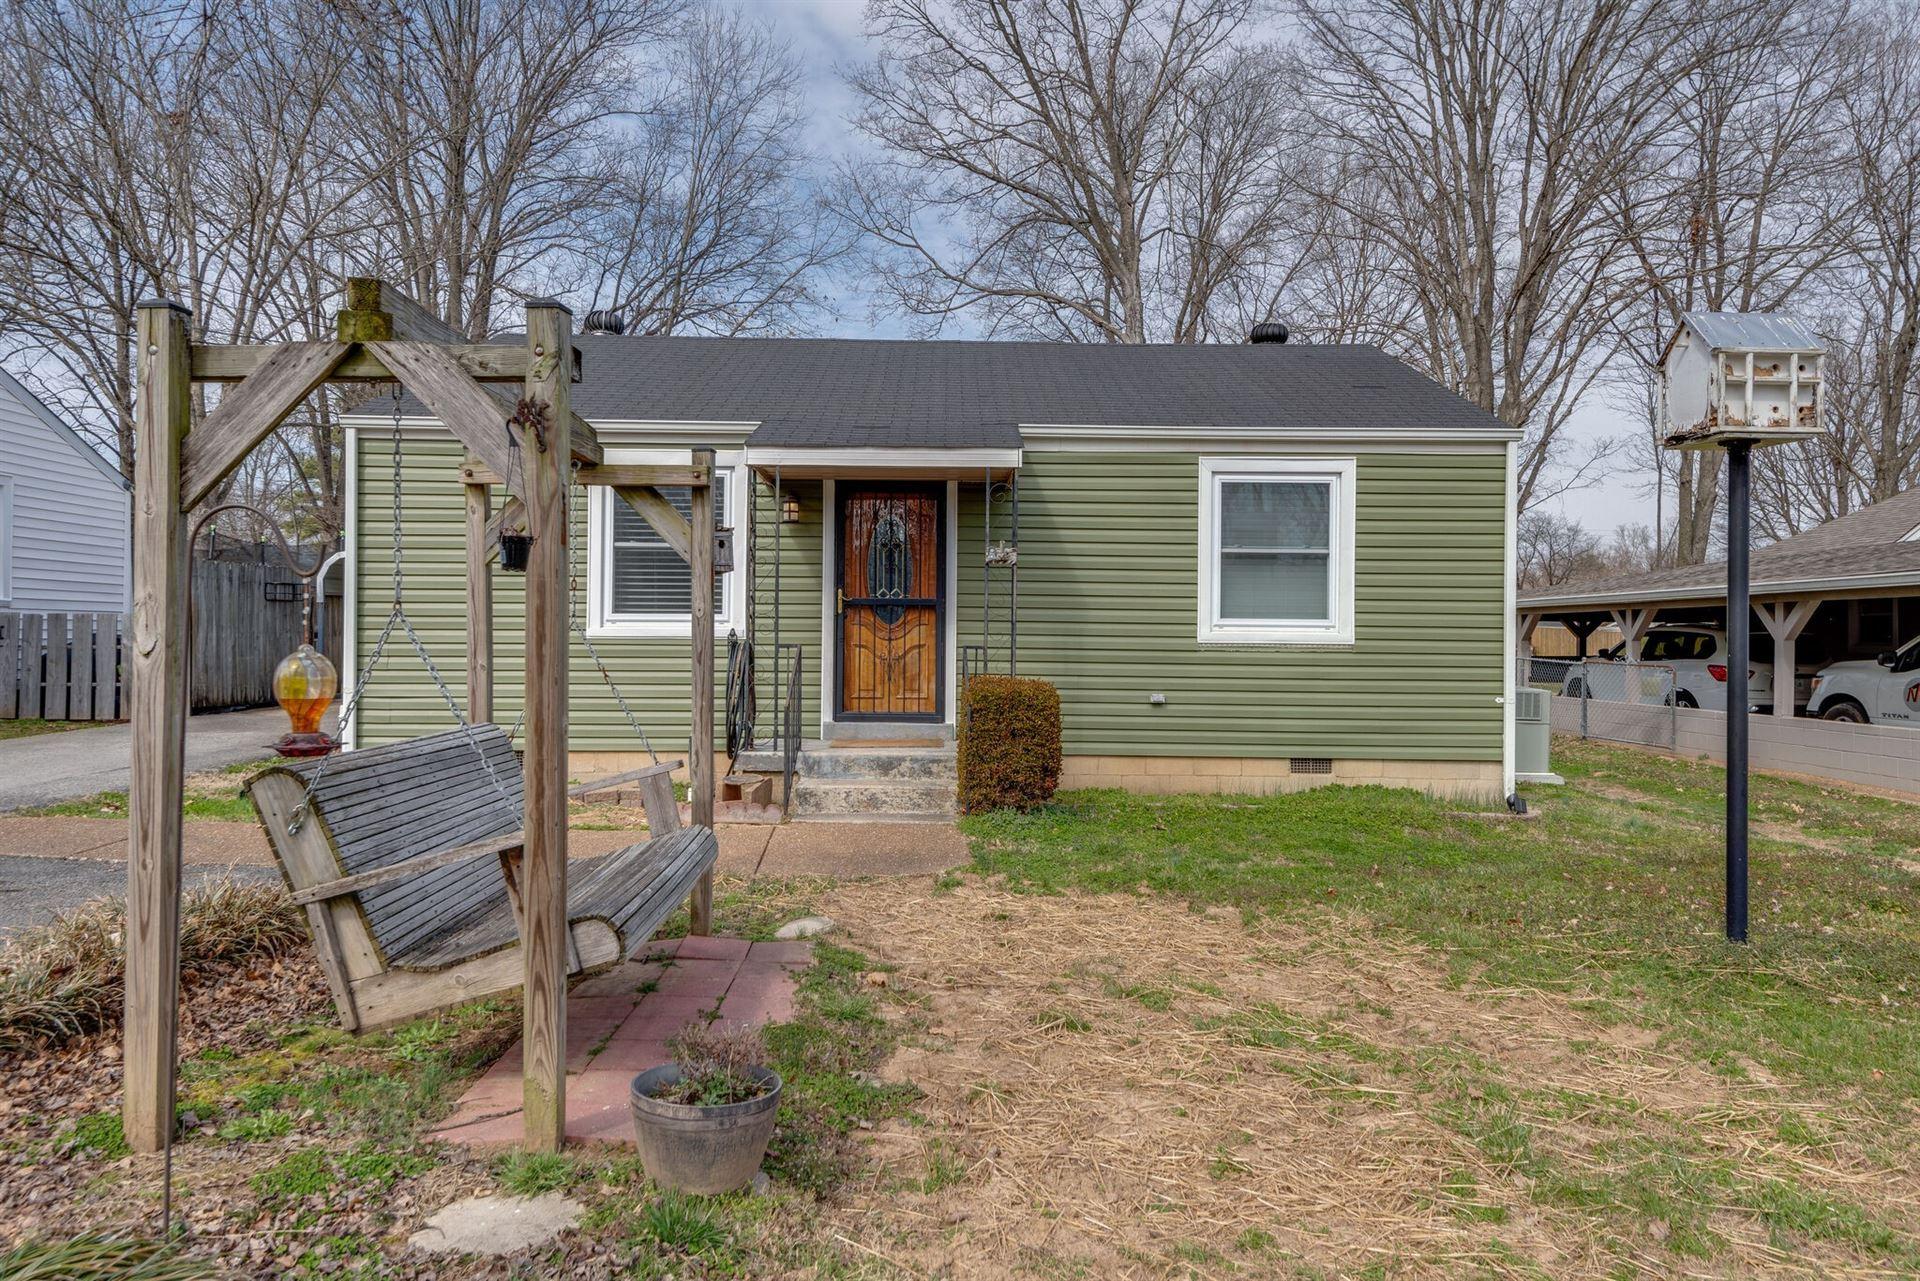 520 Eastview Cir, Franklin, TN 37064 - MLS#: 2235163